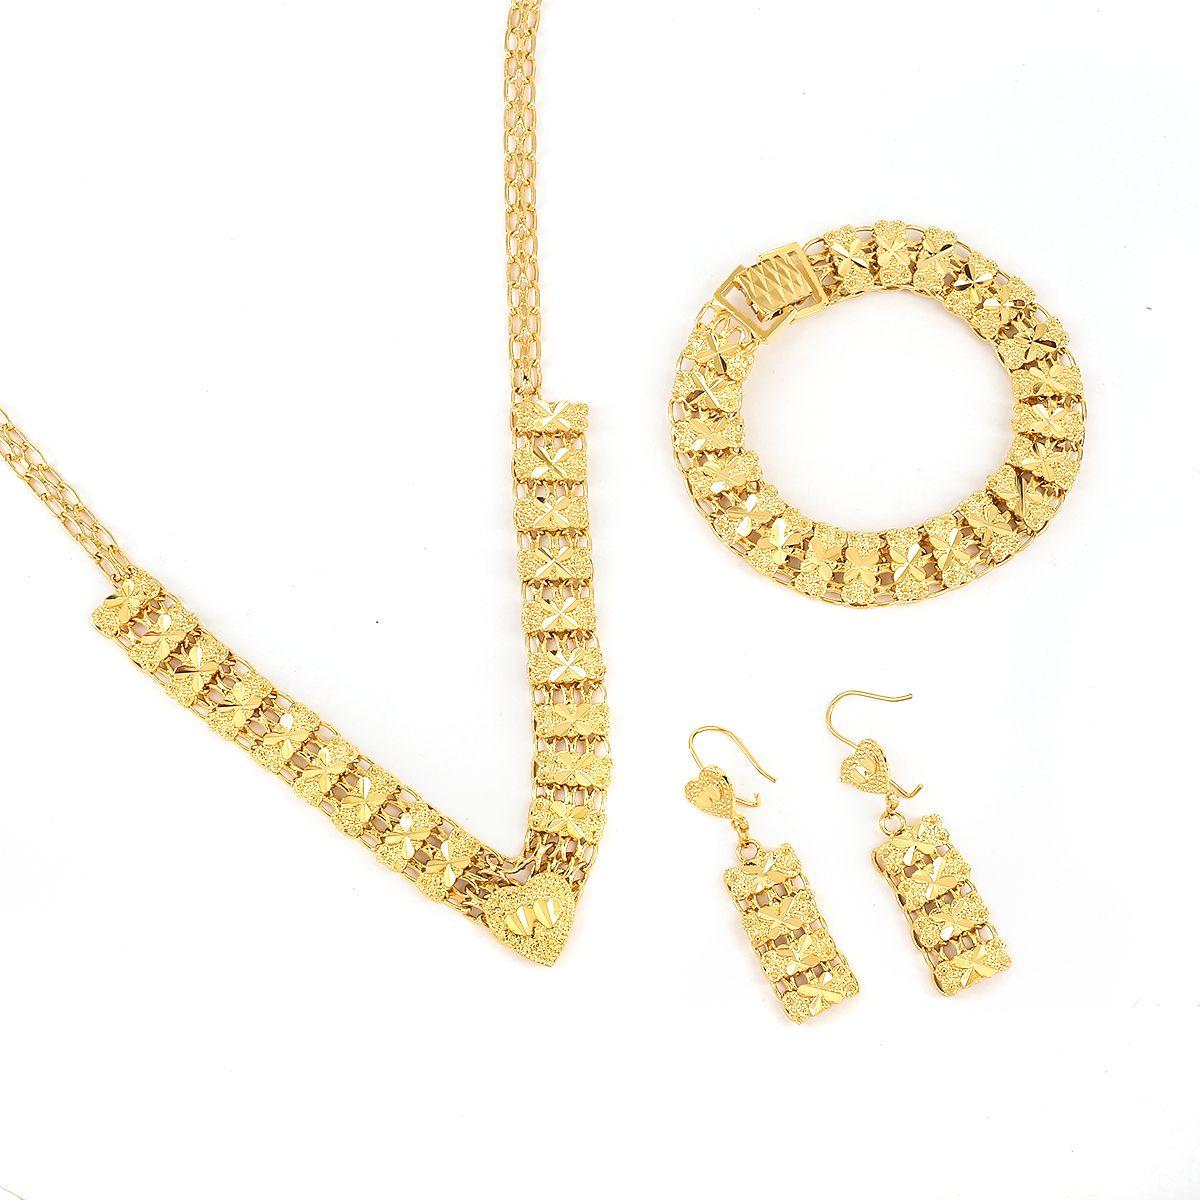 Las joyas de oro baratas más nuevas Dubai Dubai Gold Jewellery Set Turco Egipcio Argelia India Marroquí Arabia Saudita Joyería de oro